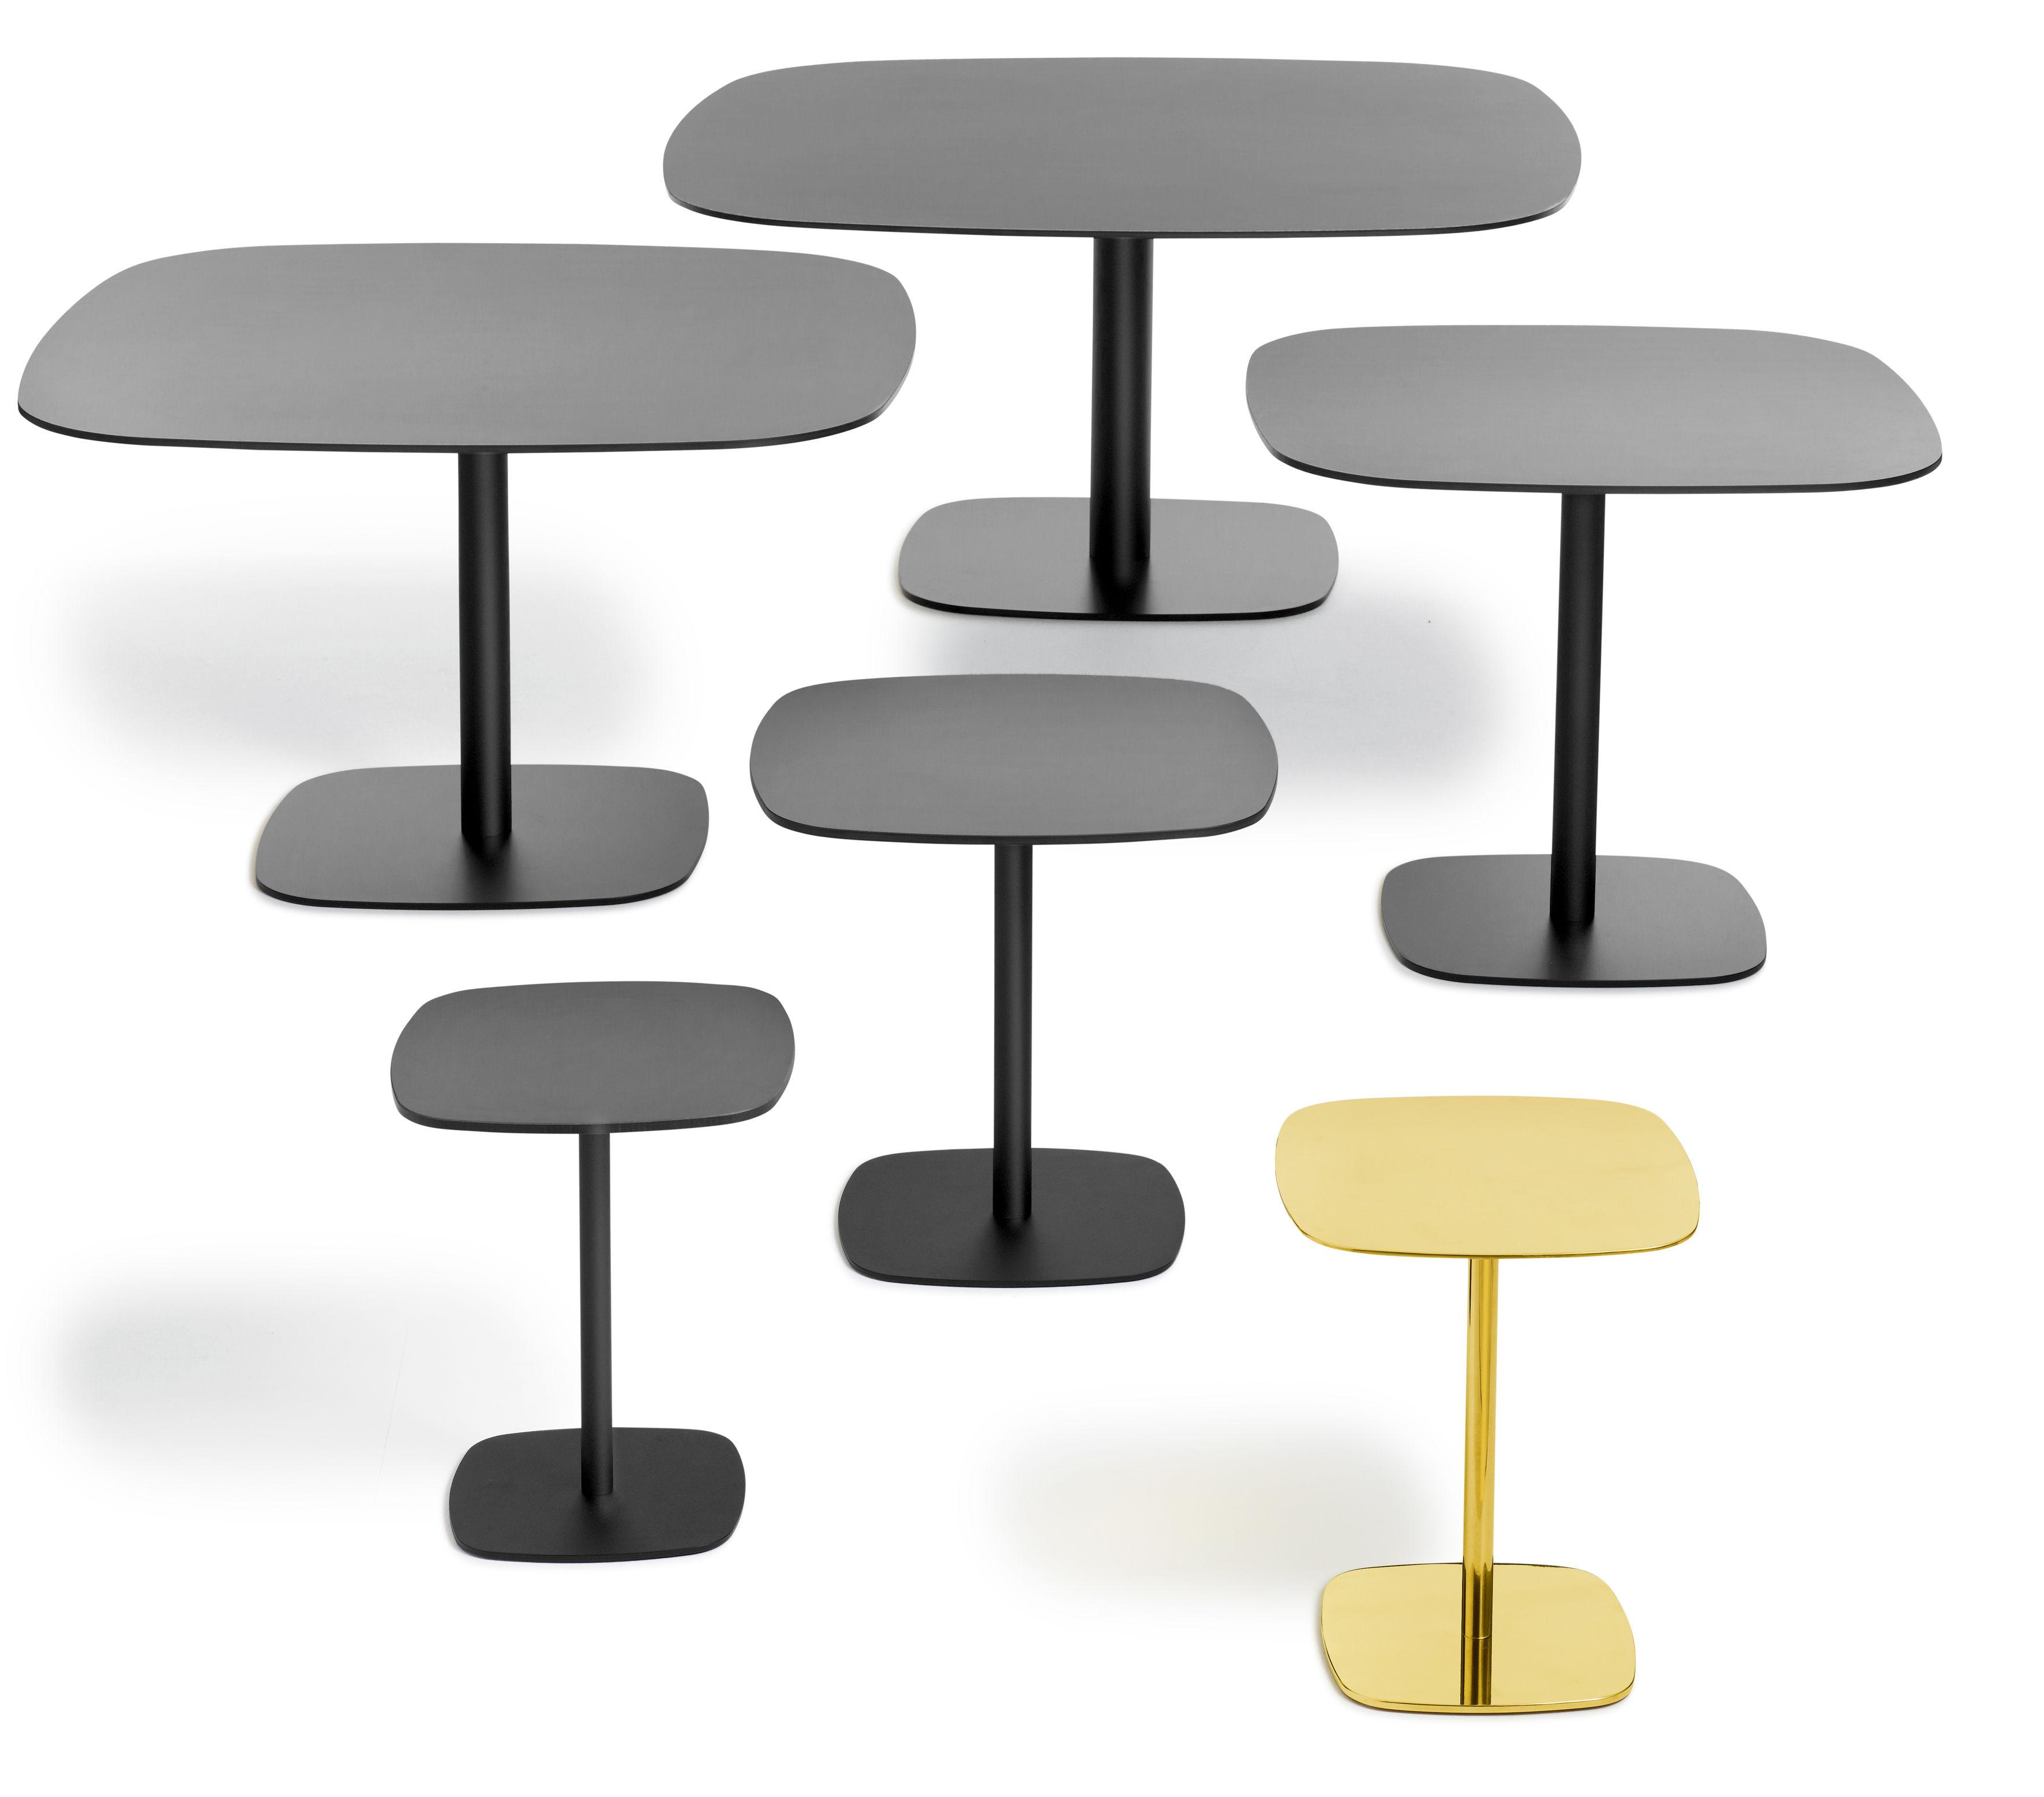 Scopri tavolino nobis 40x40 cm h 43 cm nero 40x40 cm for Tavolo 40x40